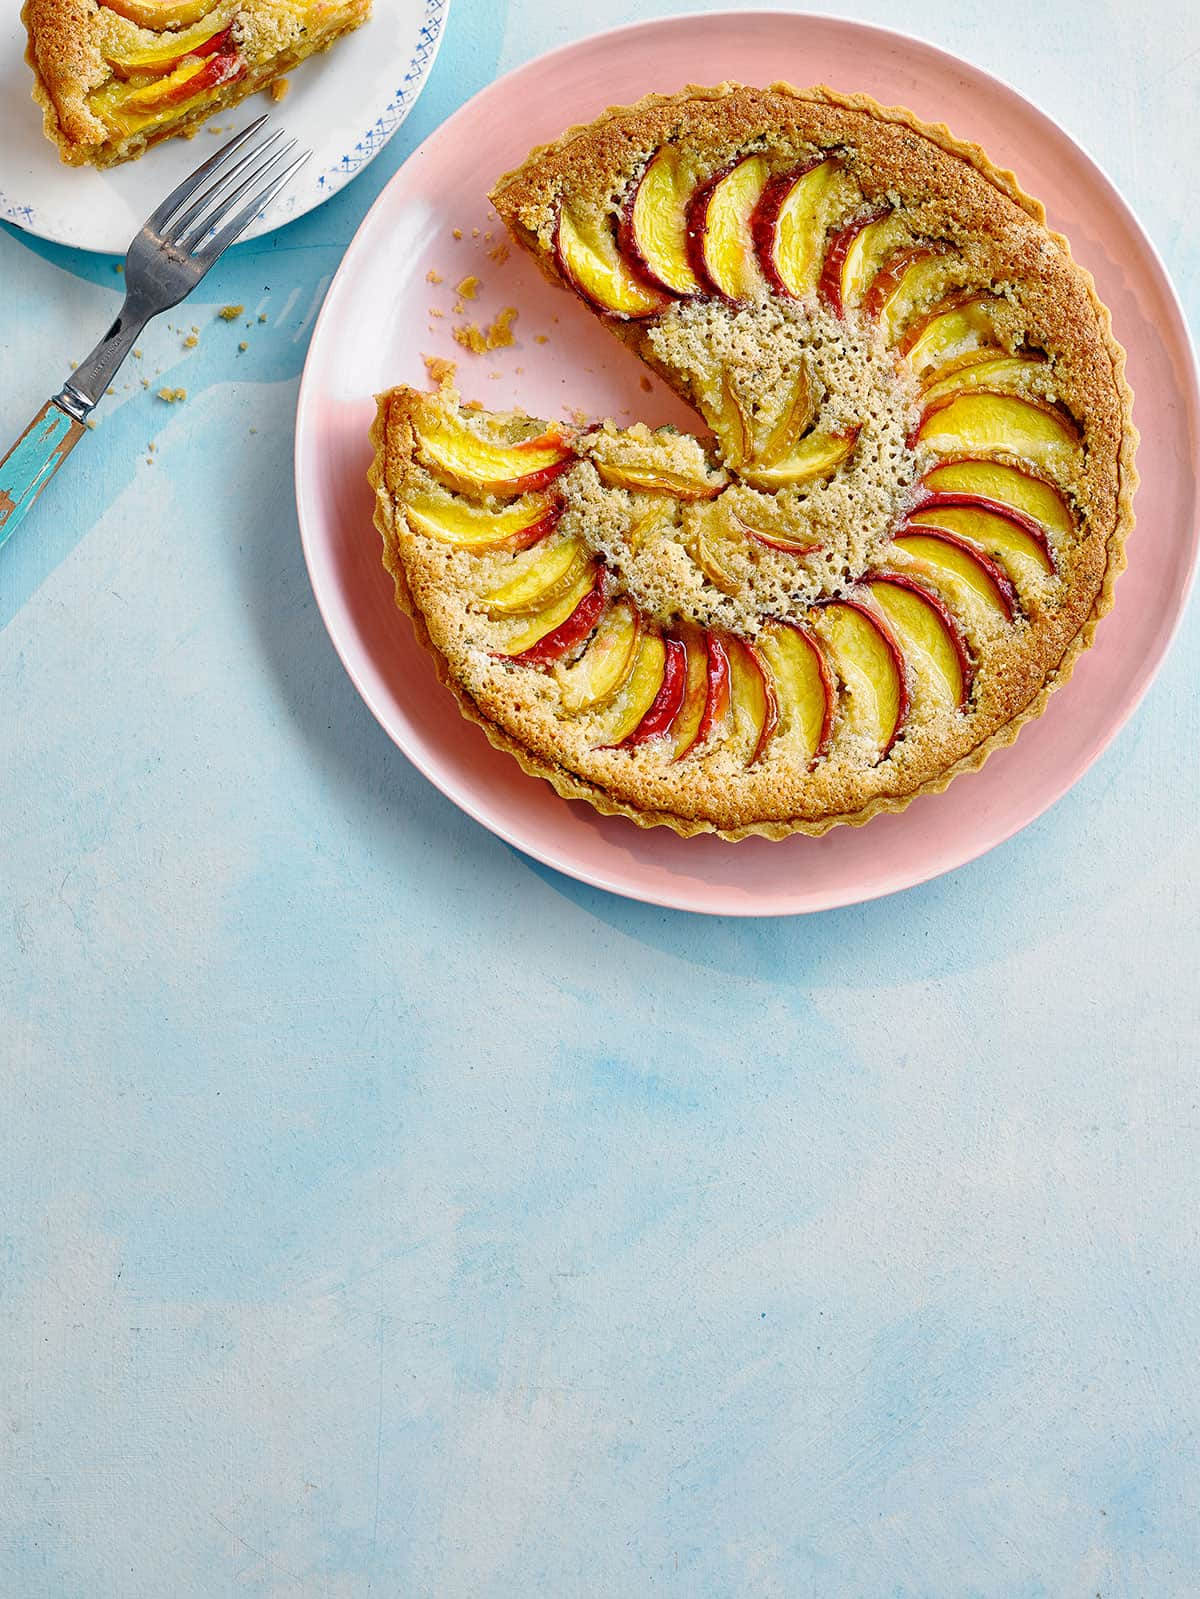 Ocado Life Food summer tart pink plates summer picnic blue backgrounds